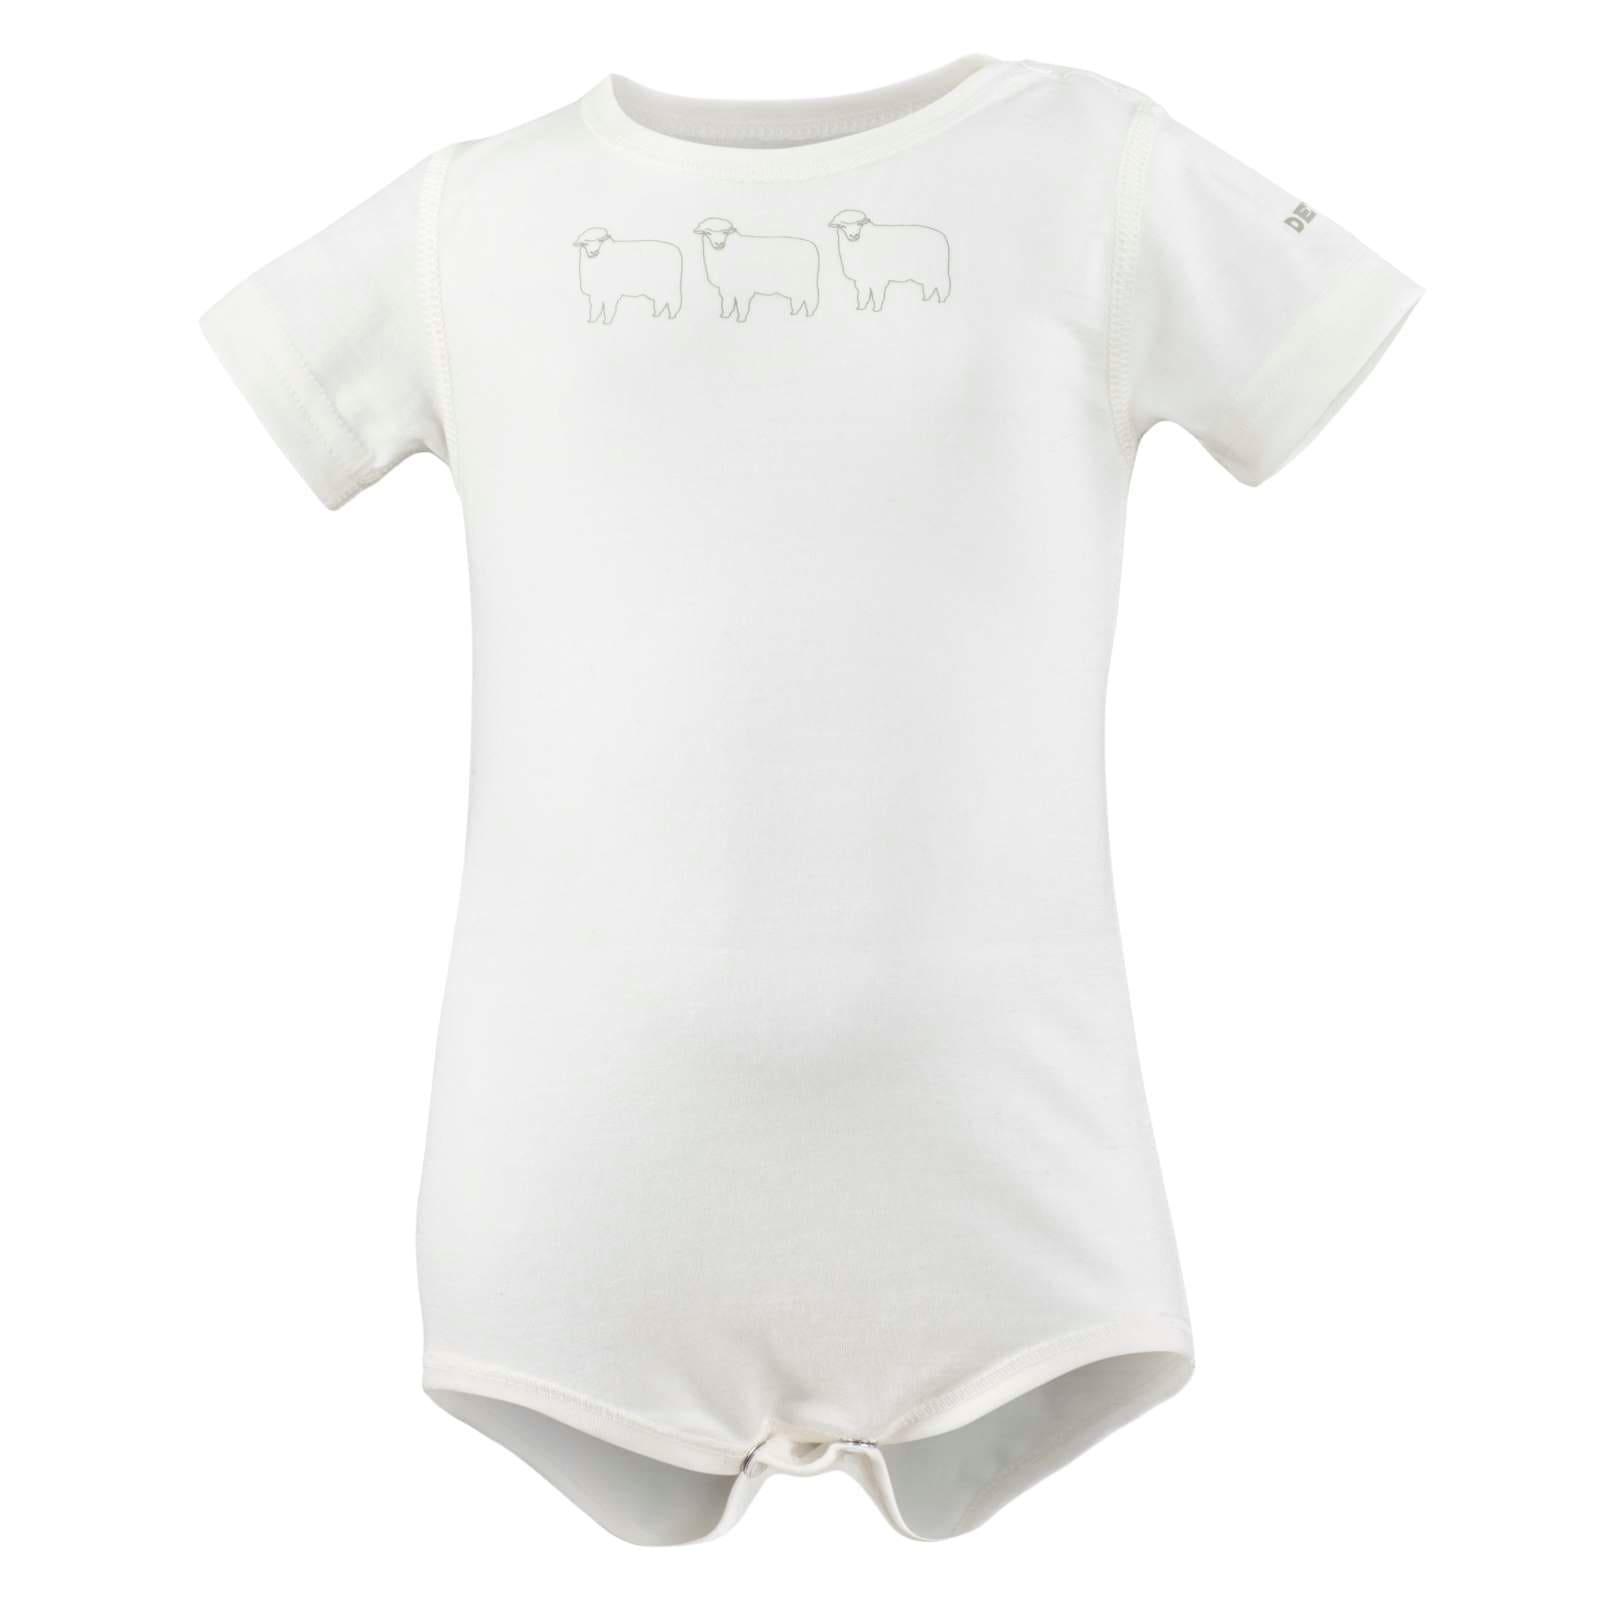 acc5a99b Kjøp Devold Breeze Baby T-Body fra Outnorth